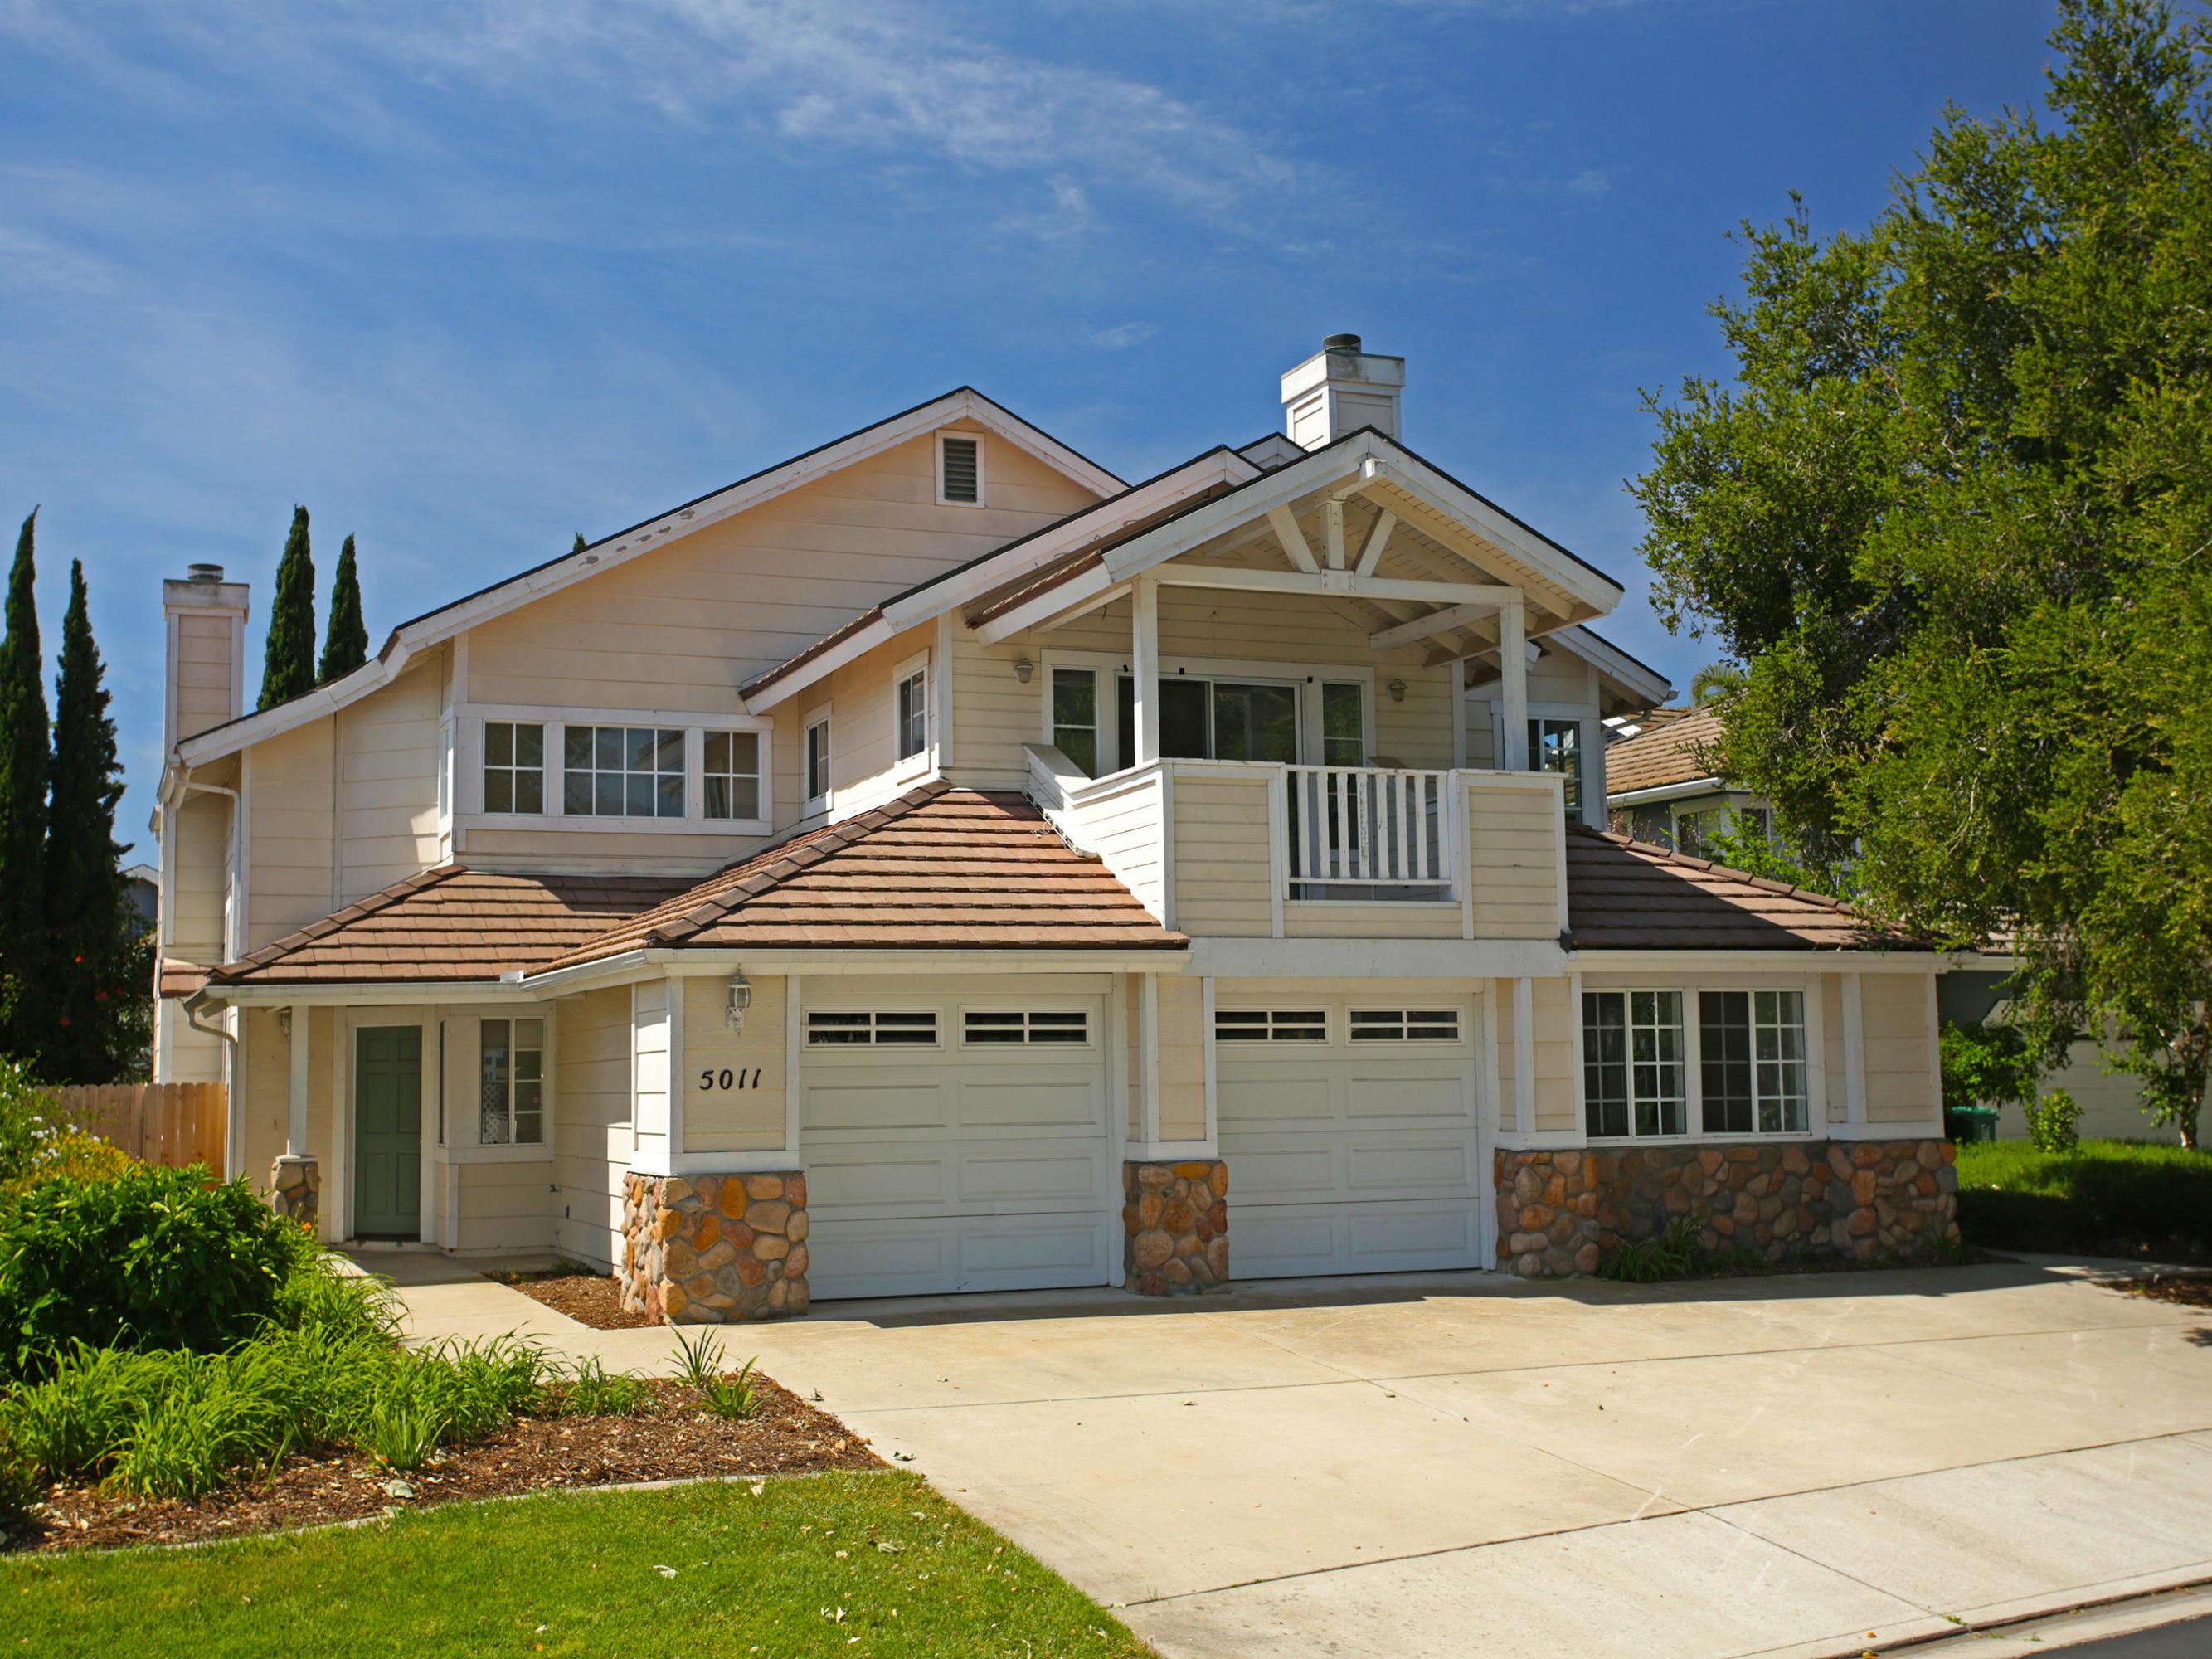 Property photo for 5011 Whitney Ct Santa Barbara, California 93111 - 14-1362